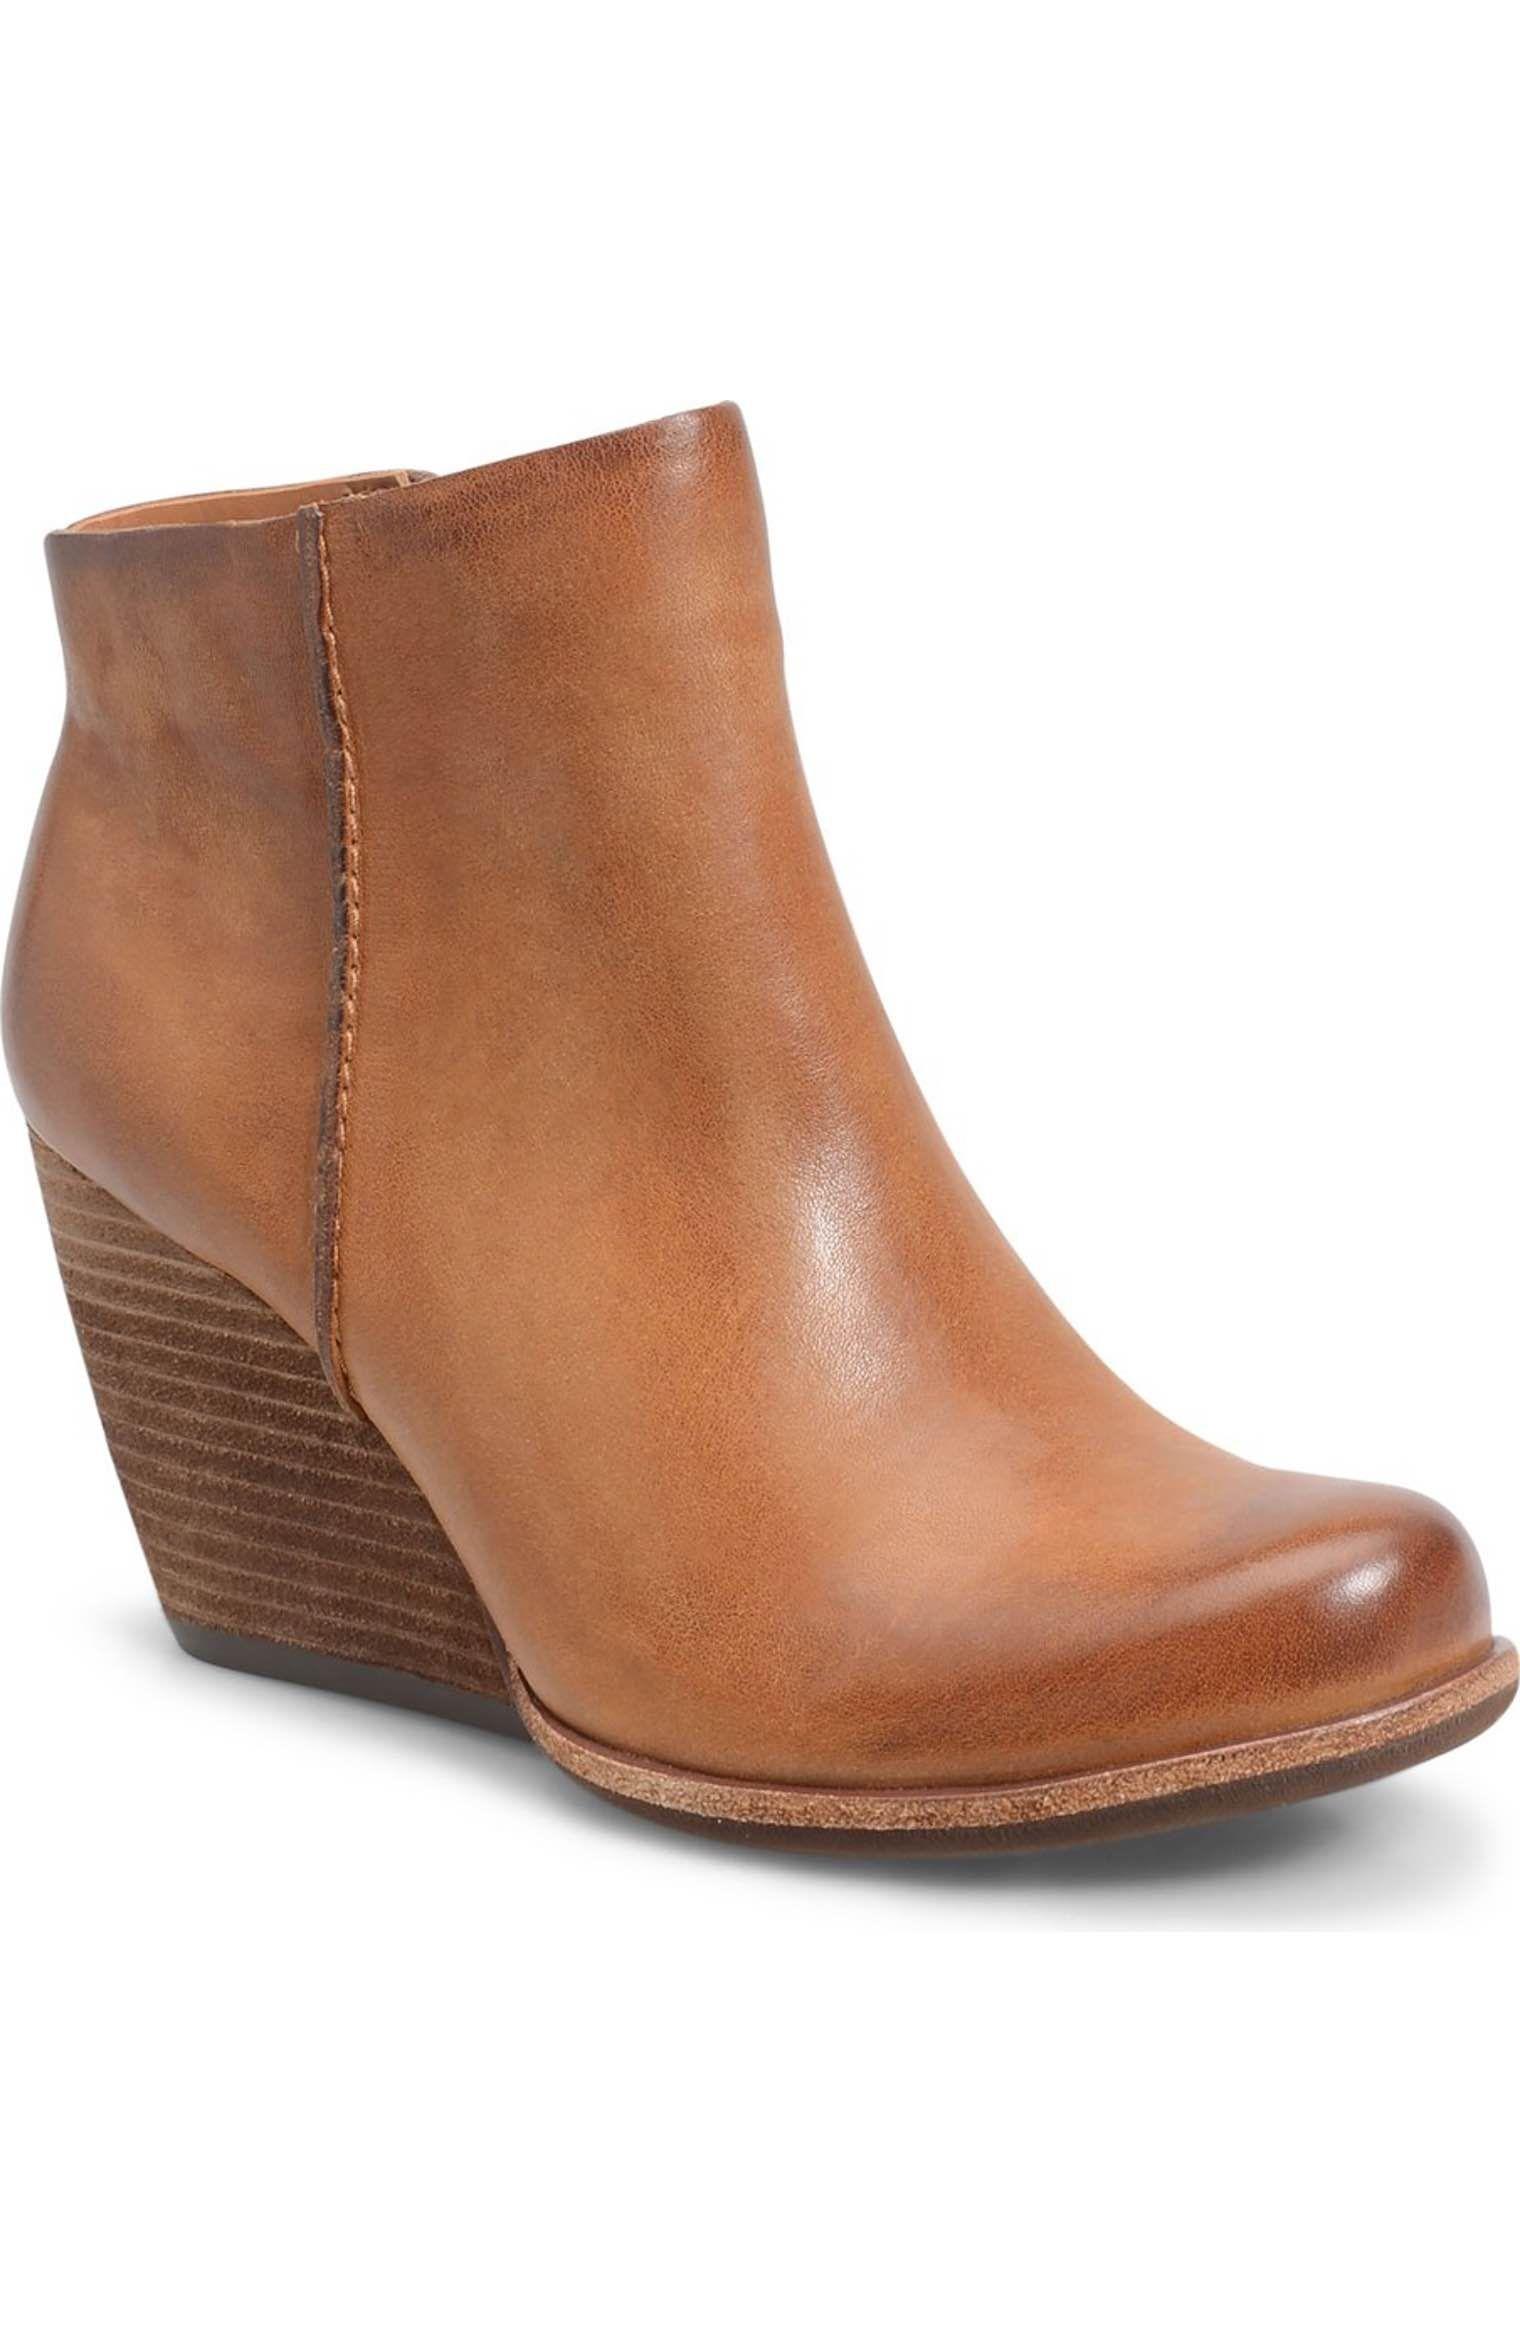 Main Image - Kork-Ease® 'Natalya' Burnished Leather Demi Wedge Boot (